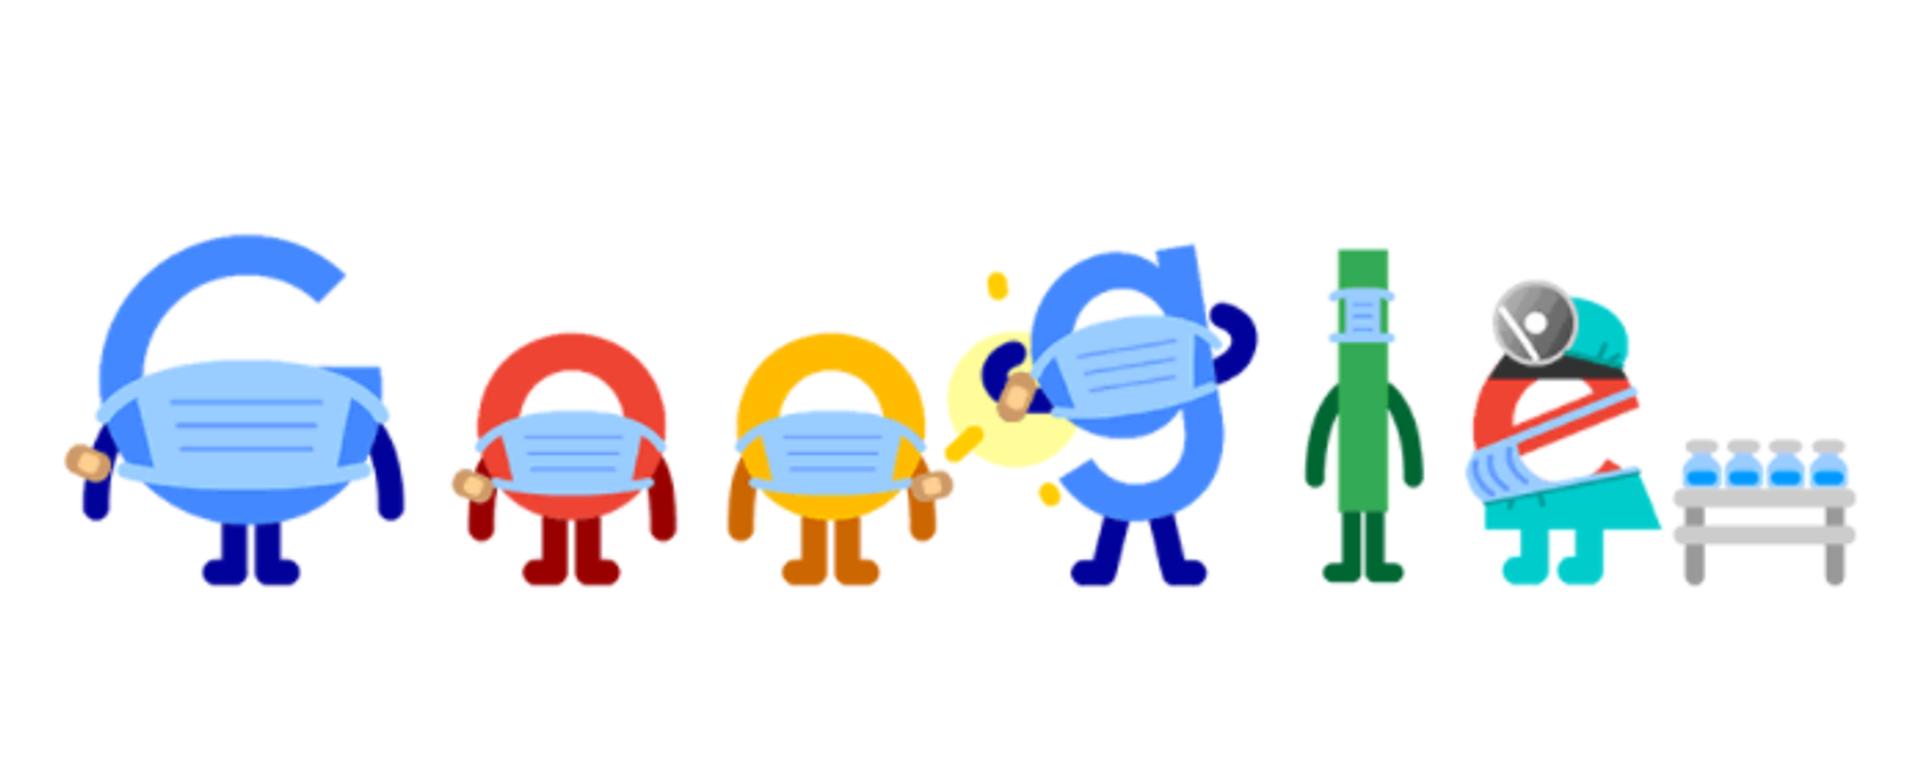 Google Doodle pro-vax - Sputnik Italia, 1920, 20.08.2021